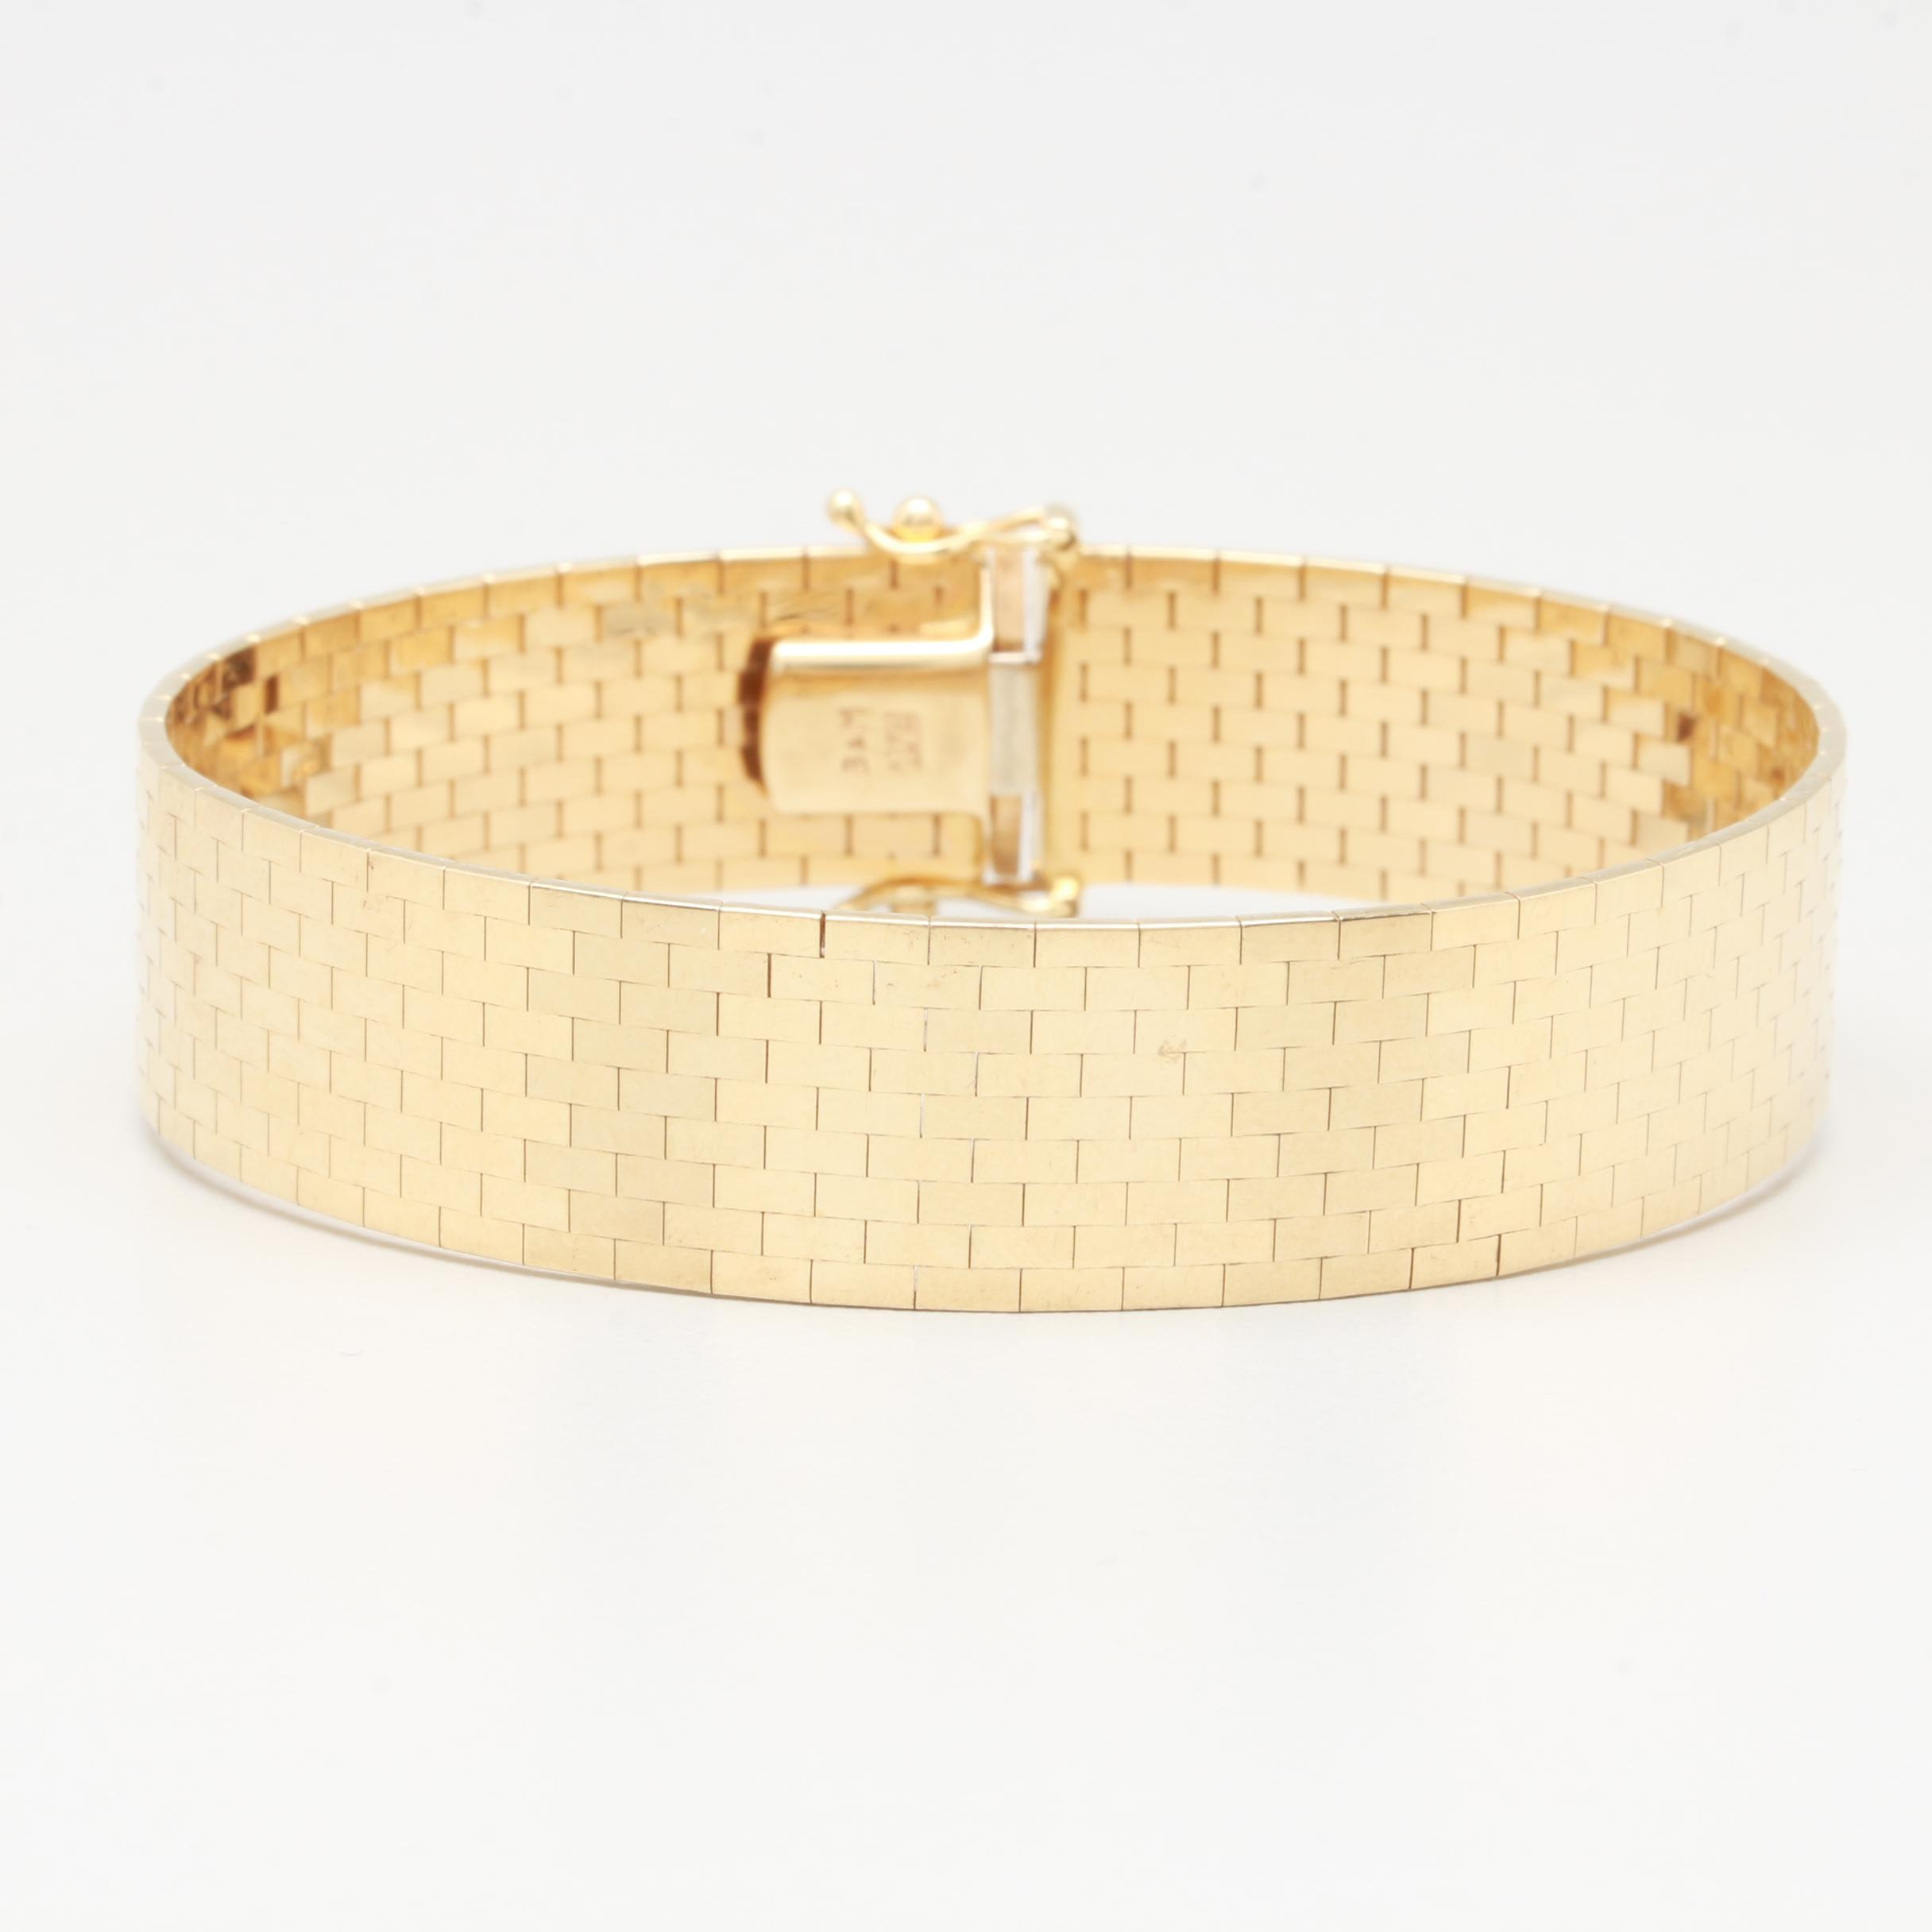 14K Yellow Gold Panther Mesh High Polished Bracelet